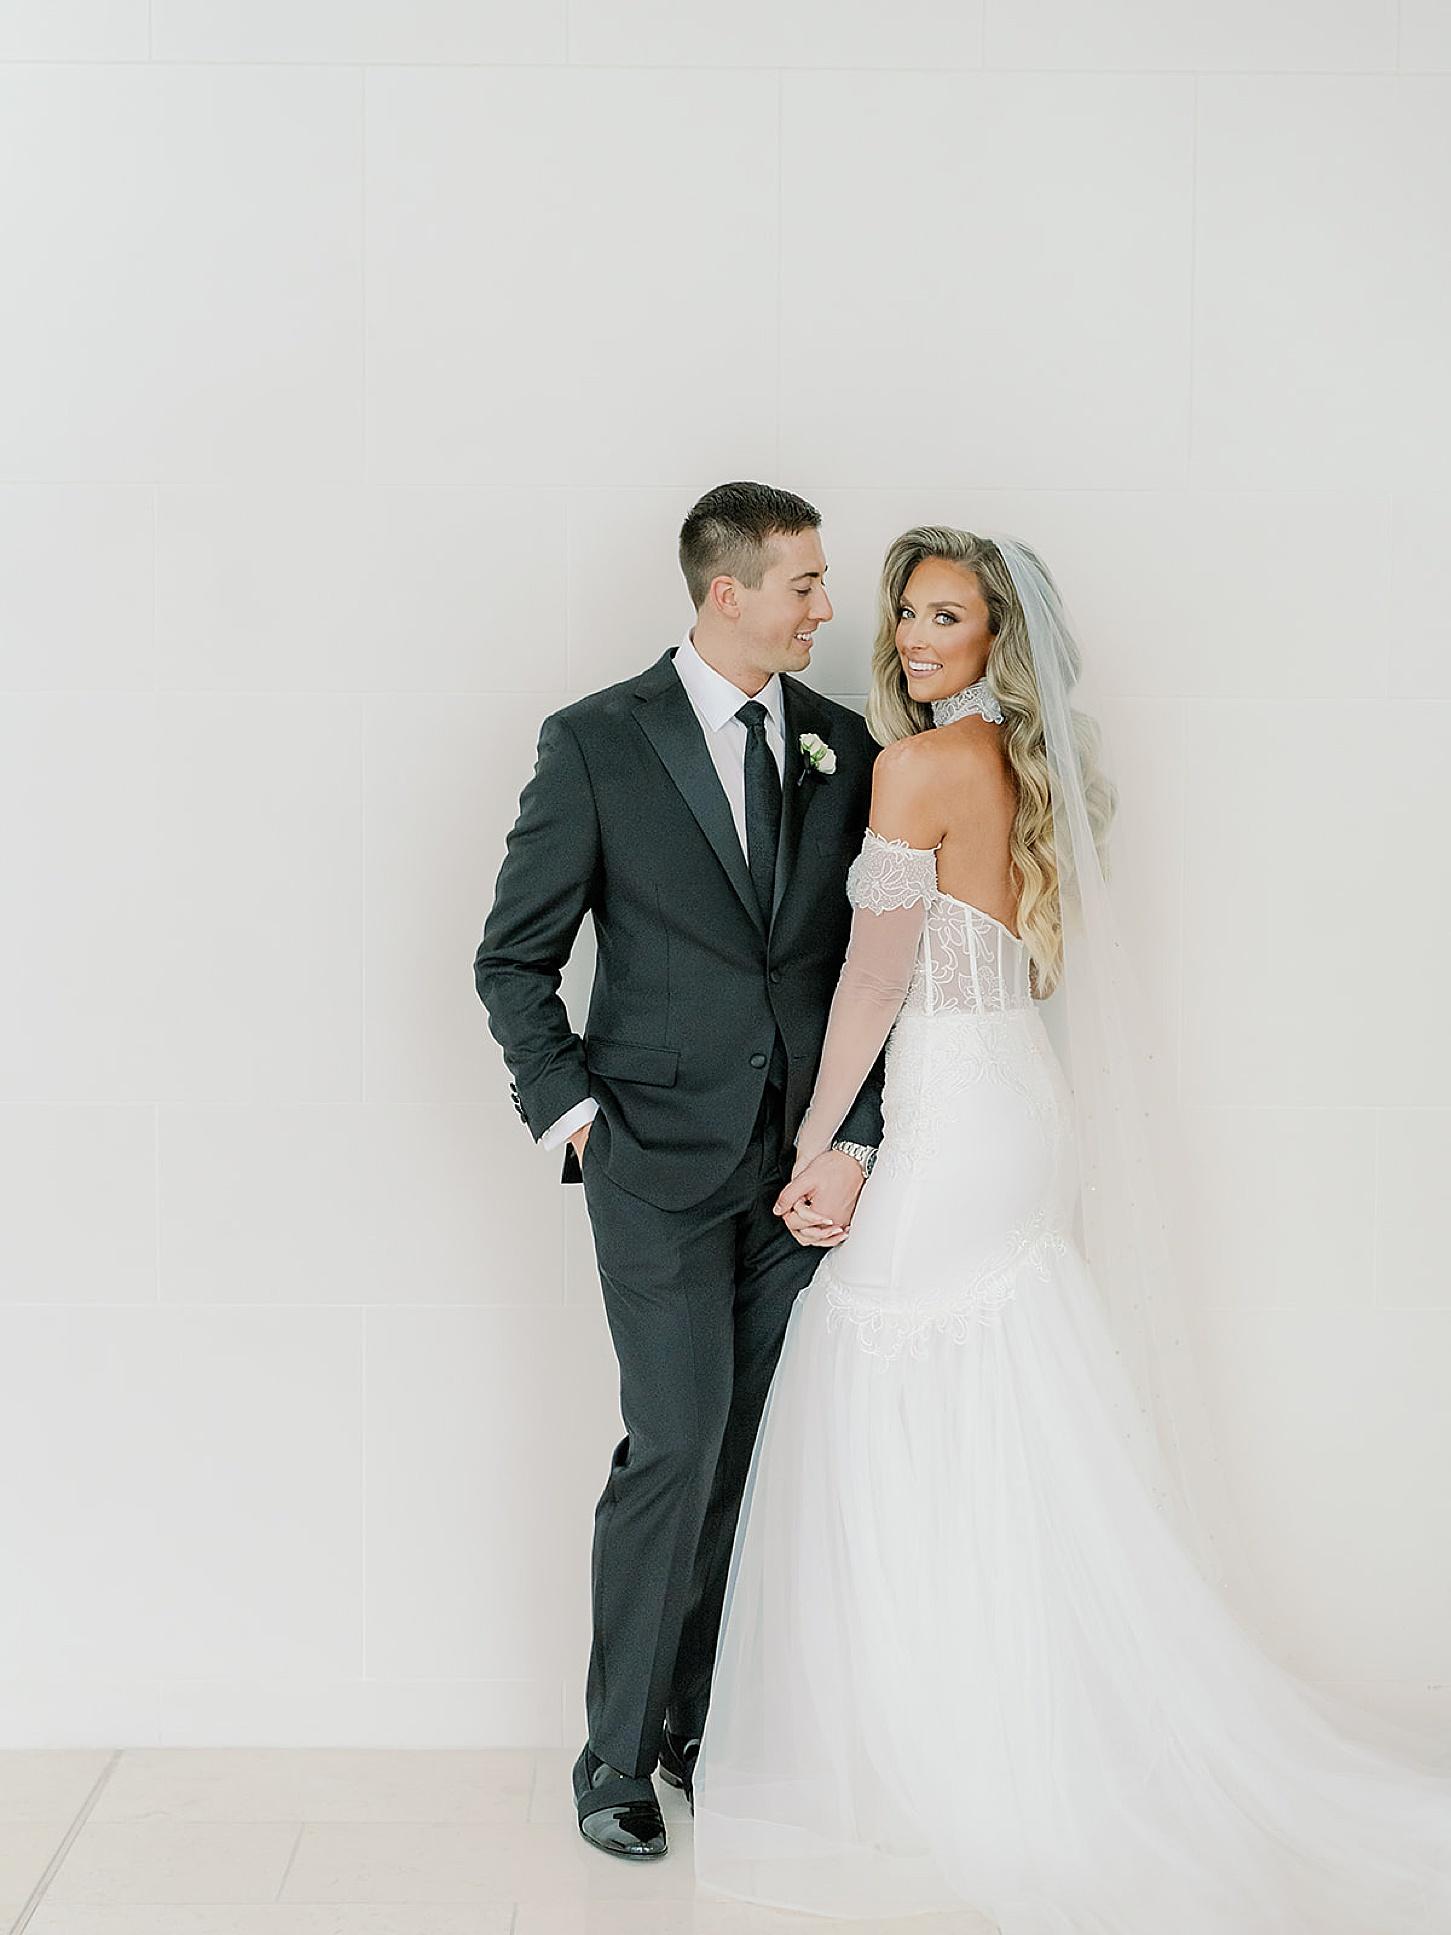 Atlantic City Wedding Photography Studio by Magdalena Studios Lexy Cha 0058